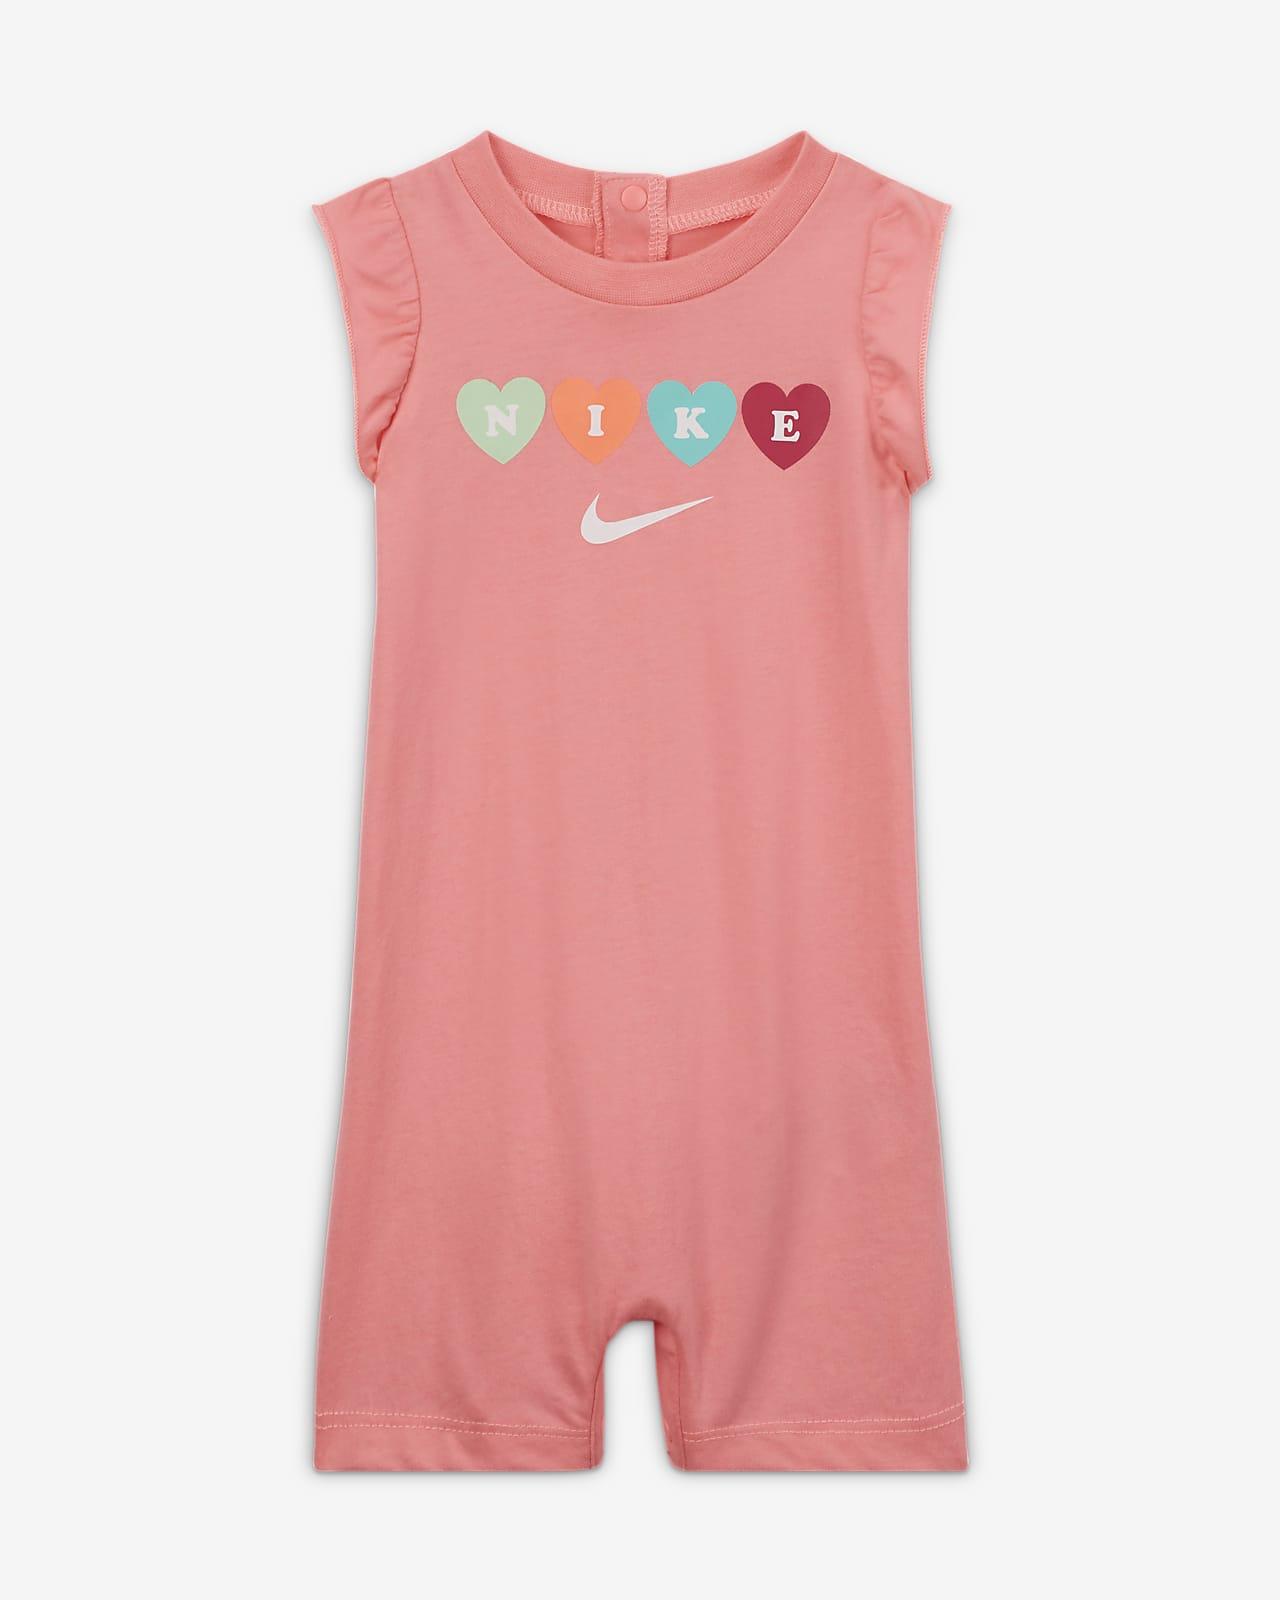 Nike-buksedragt til babyer (0-9M)